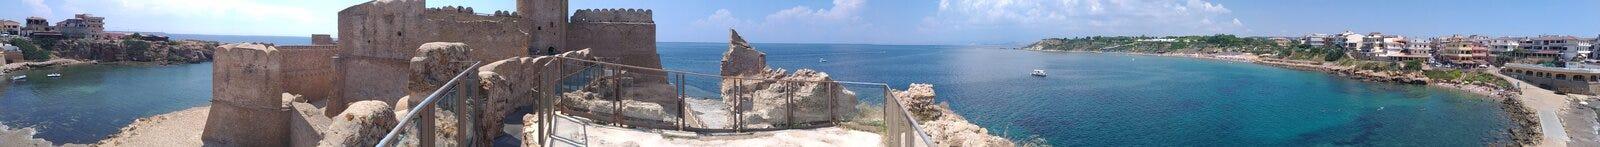 Le Castella - панорамное стоковые фотографии rf